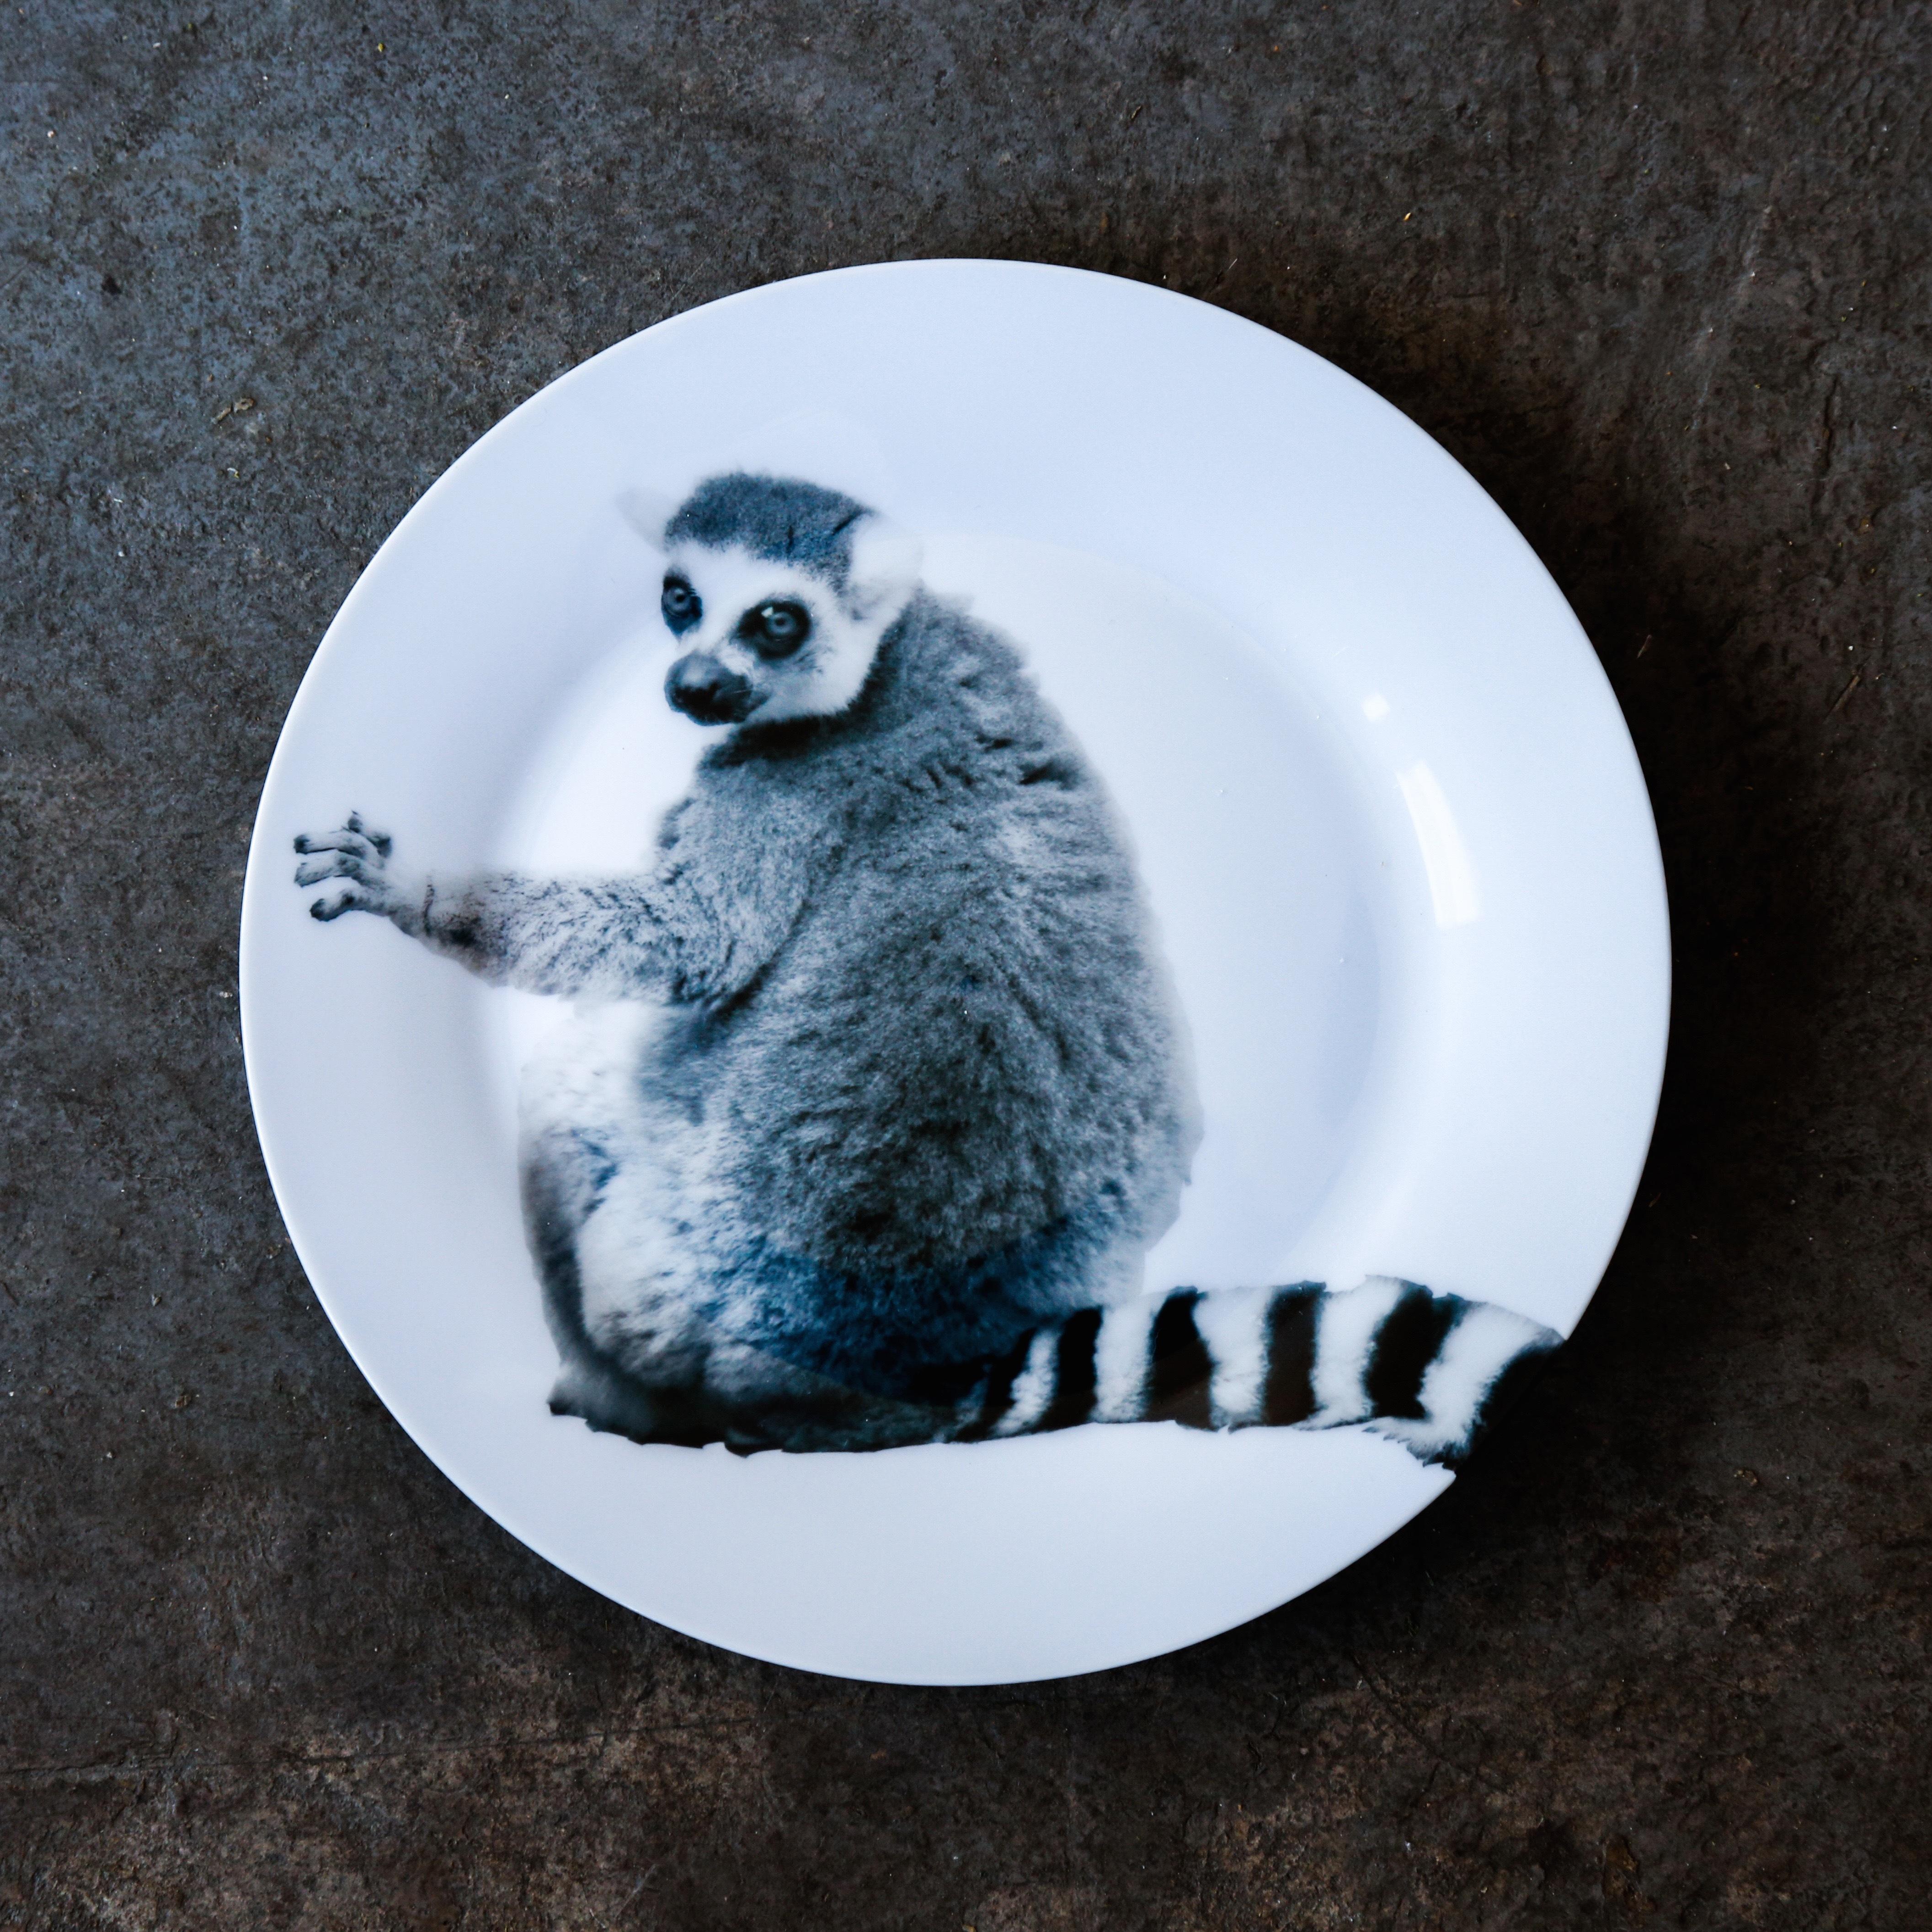 《michirico》動物たちの飾るお皿「ワオキツネザル」